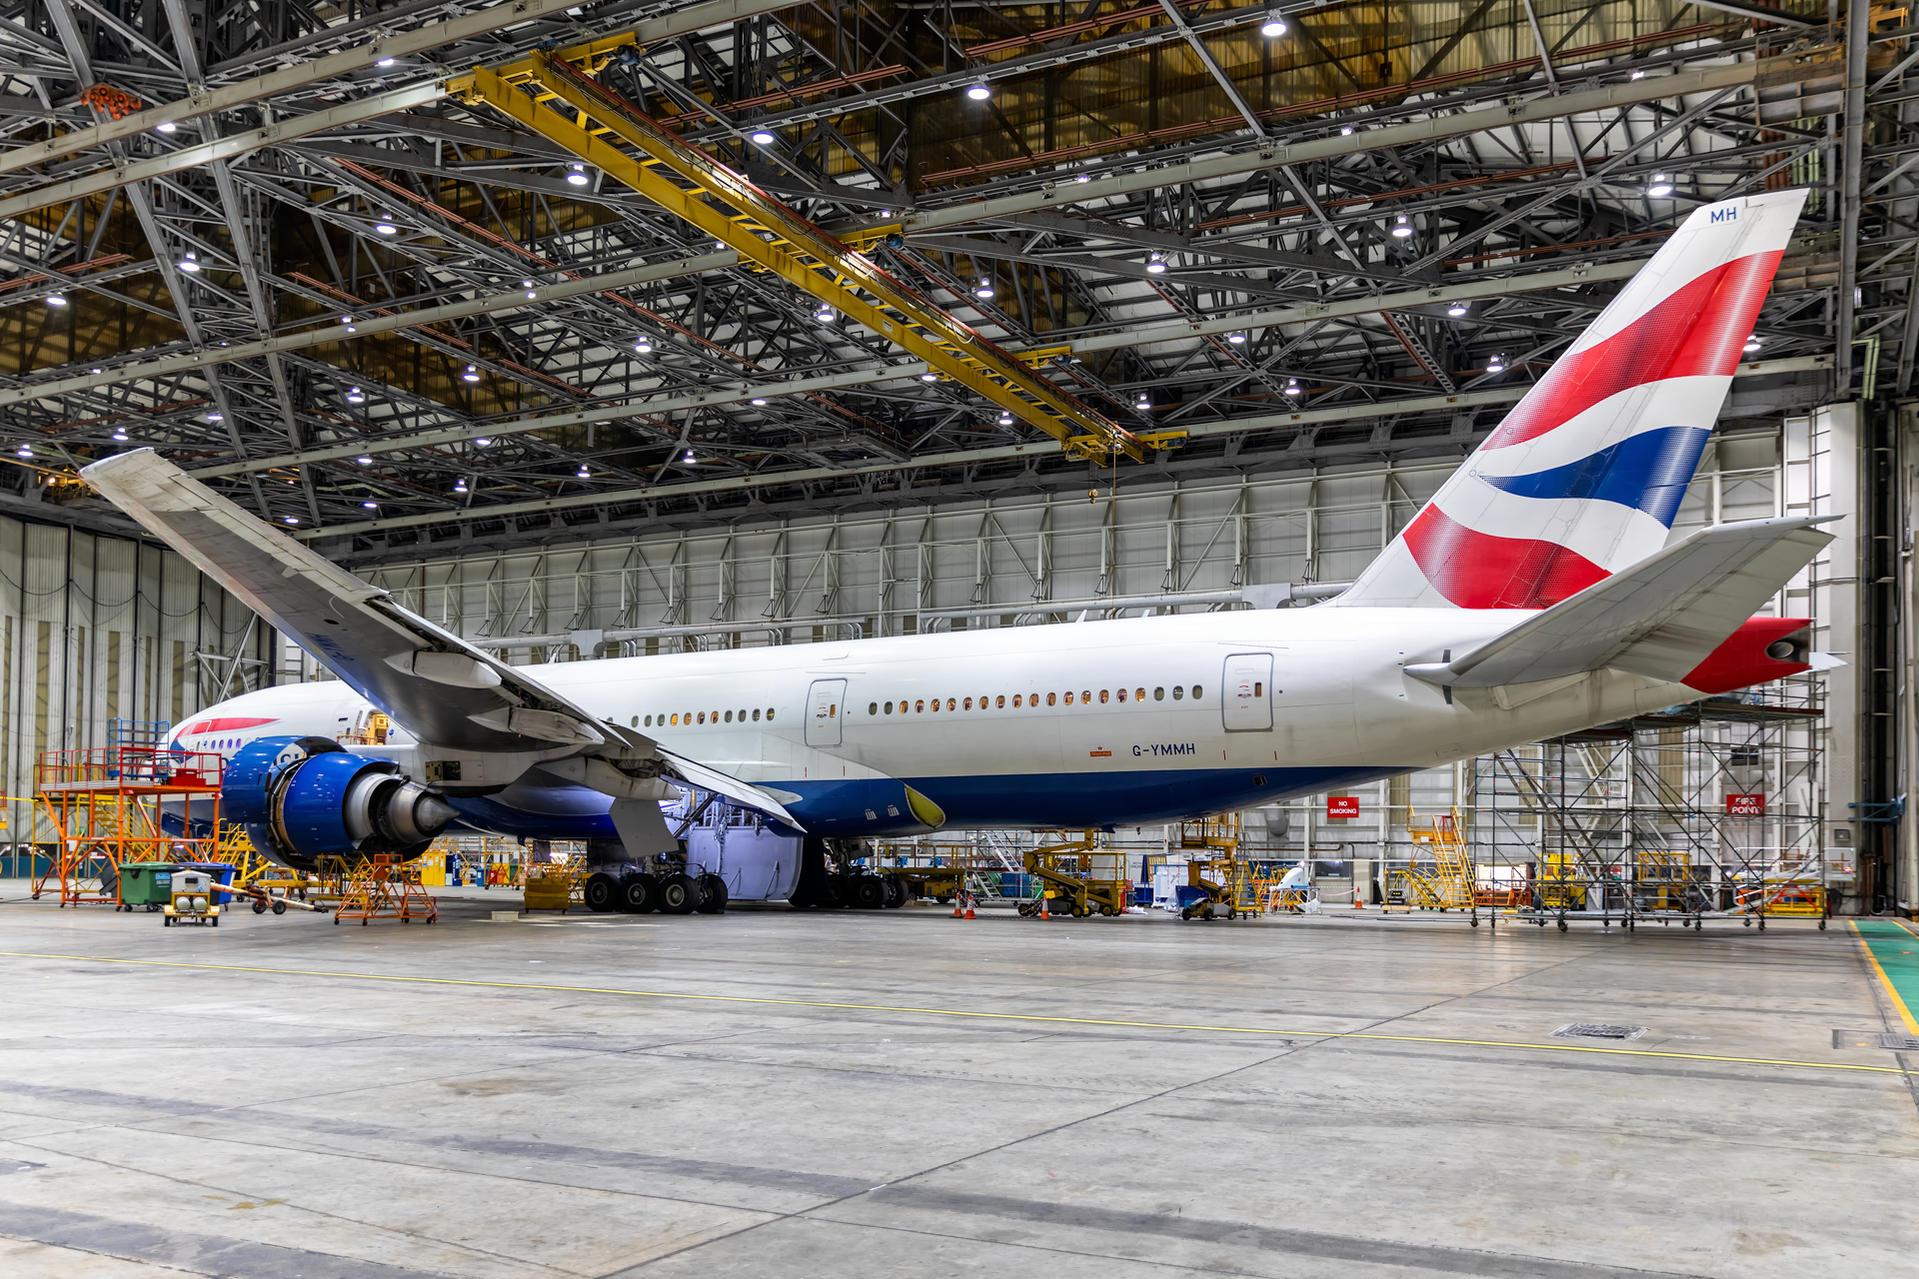 Click image for larger version.  Name:BA-772-hangar-web.jpg Views:19 Size:538.9 KB ID:25901